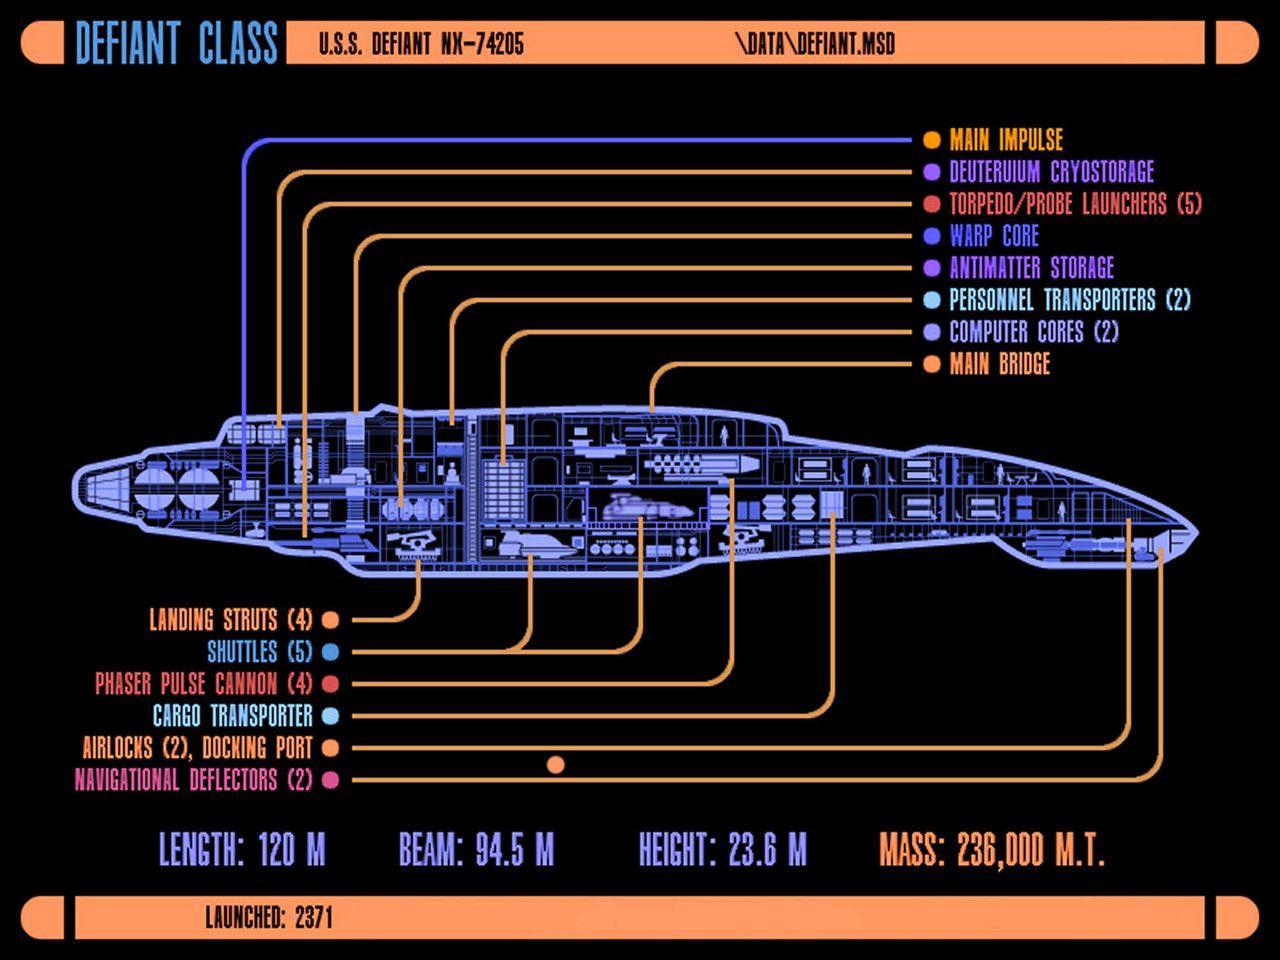 lCROtTO Uss Enterprise Schematic on enterprise nx-01 schematics, star trek voyager schematics, enterprise-d schematics, enterprise-j schematics, uss defiant schematics, star trek lcars schematics, ds9 schematics, gilso star trek schematics, uss ncc-1701 d, enterprise-e schematics, star trek enterprise schematics, robotech schematics, new enterprise ncc-1701 schematics, uss voyager specifications, uss excelsior schematics, ncc 1701 e schematics, uss vengeance schematics, uss voyager lcars, uss voyager schematics, uss reliant schematics,